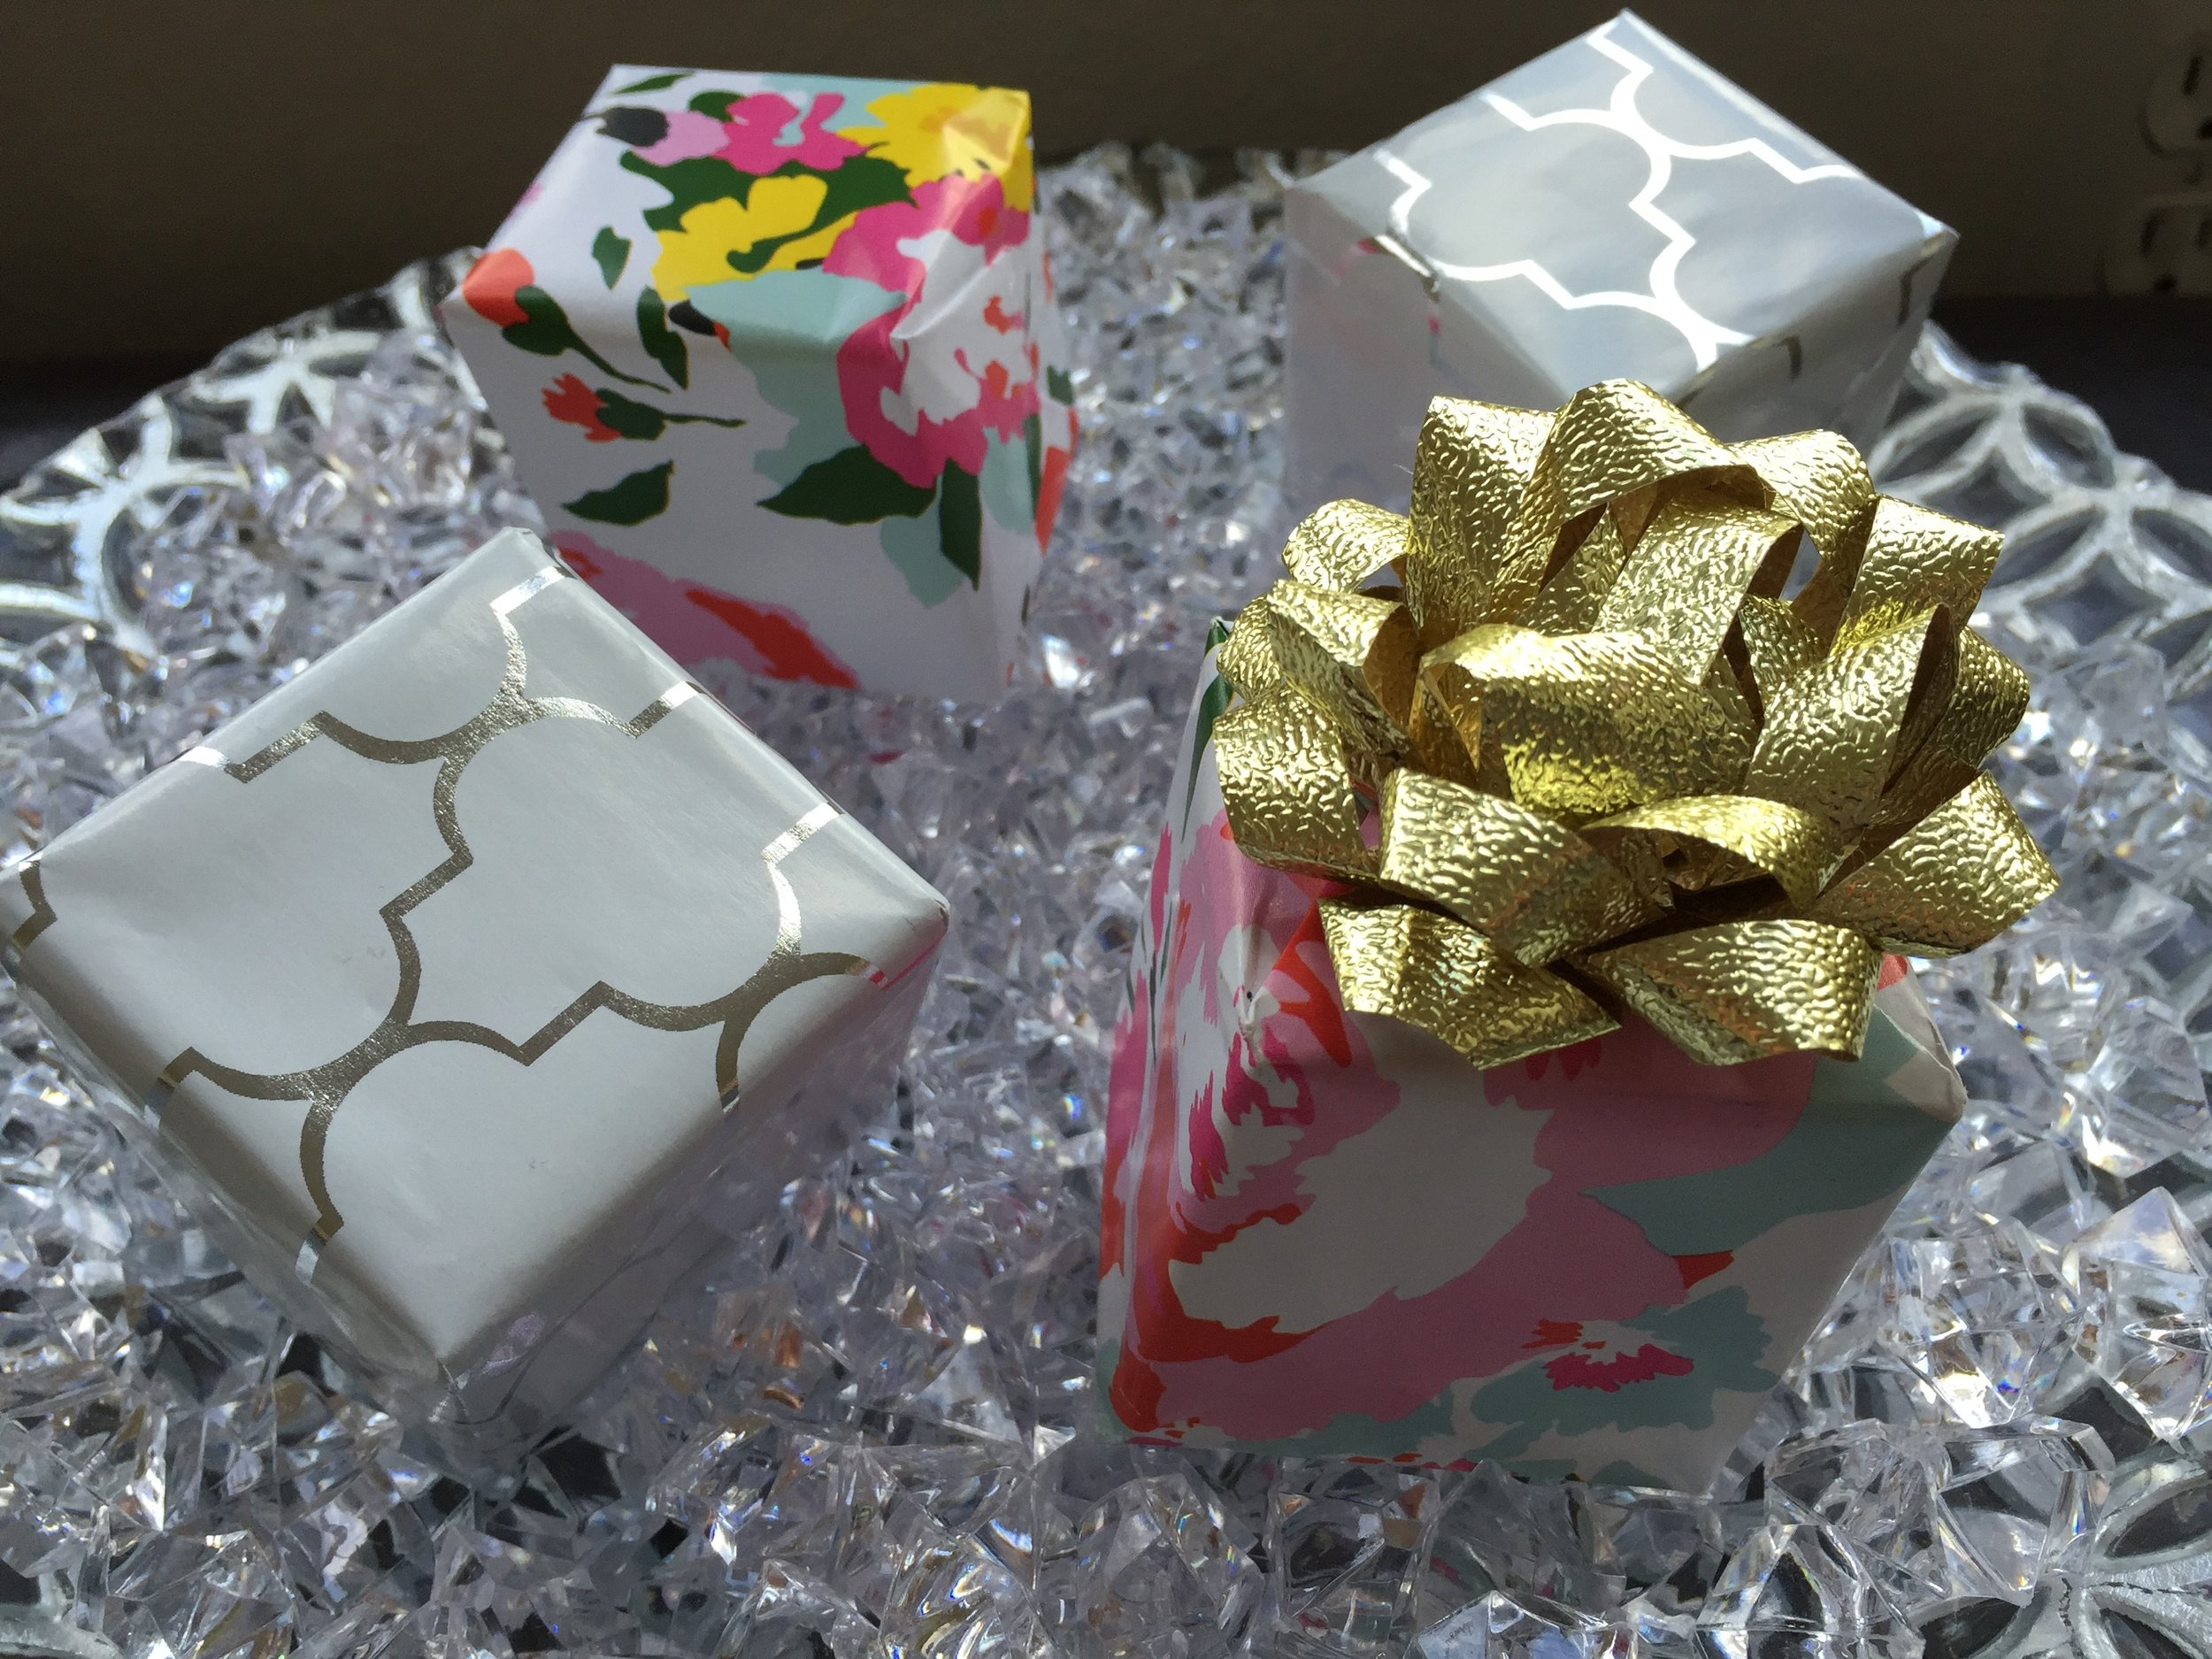 Flask Lip Balm Gifts.JPG